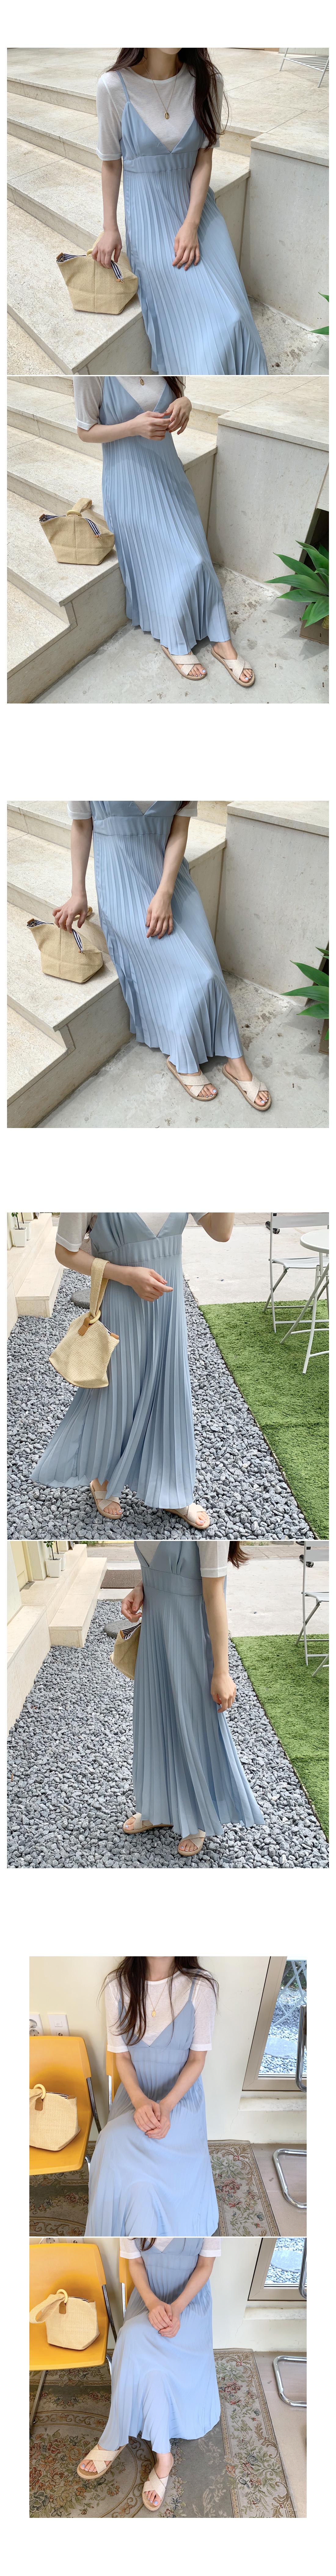 Maxi Pleat Nash Long Dress